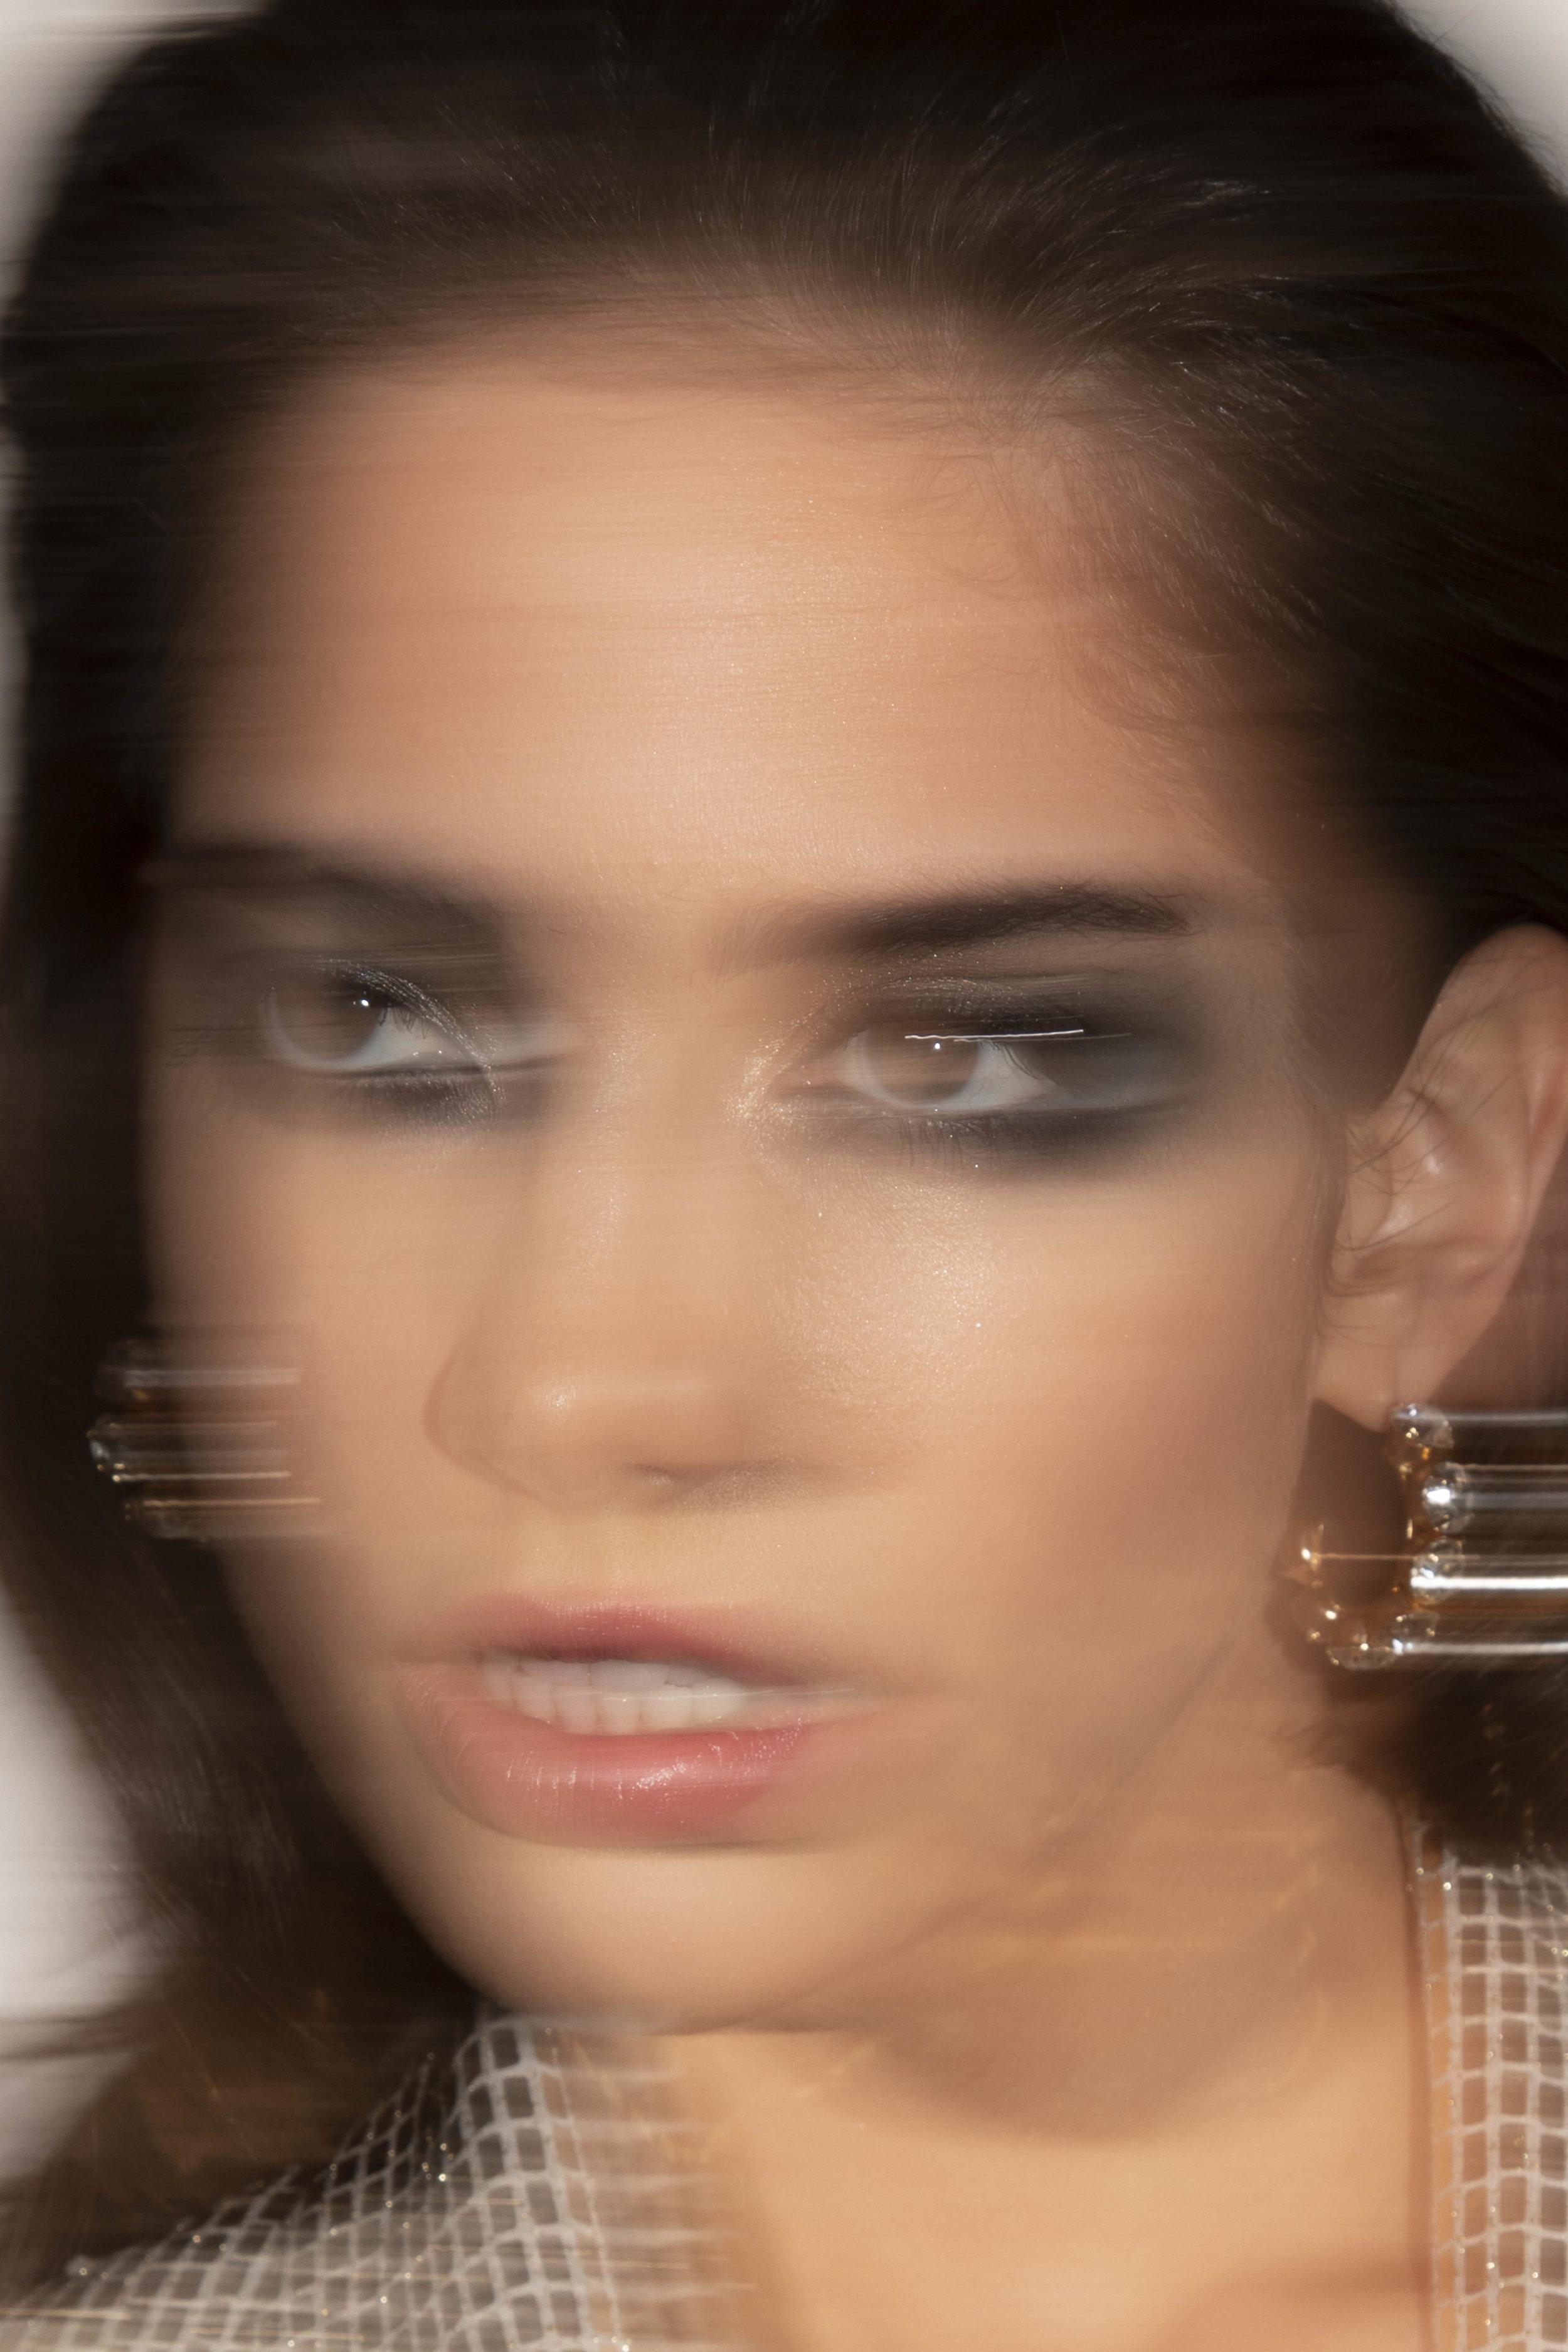 Photography and Creative Direction by  Megan Elman  Make-up by Eoin Whelan   Hair by Sophia Hadjisergis